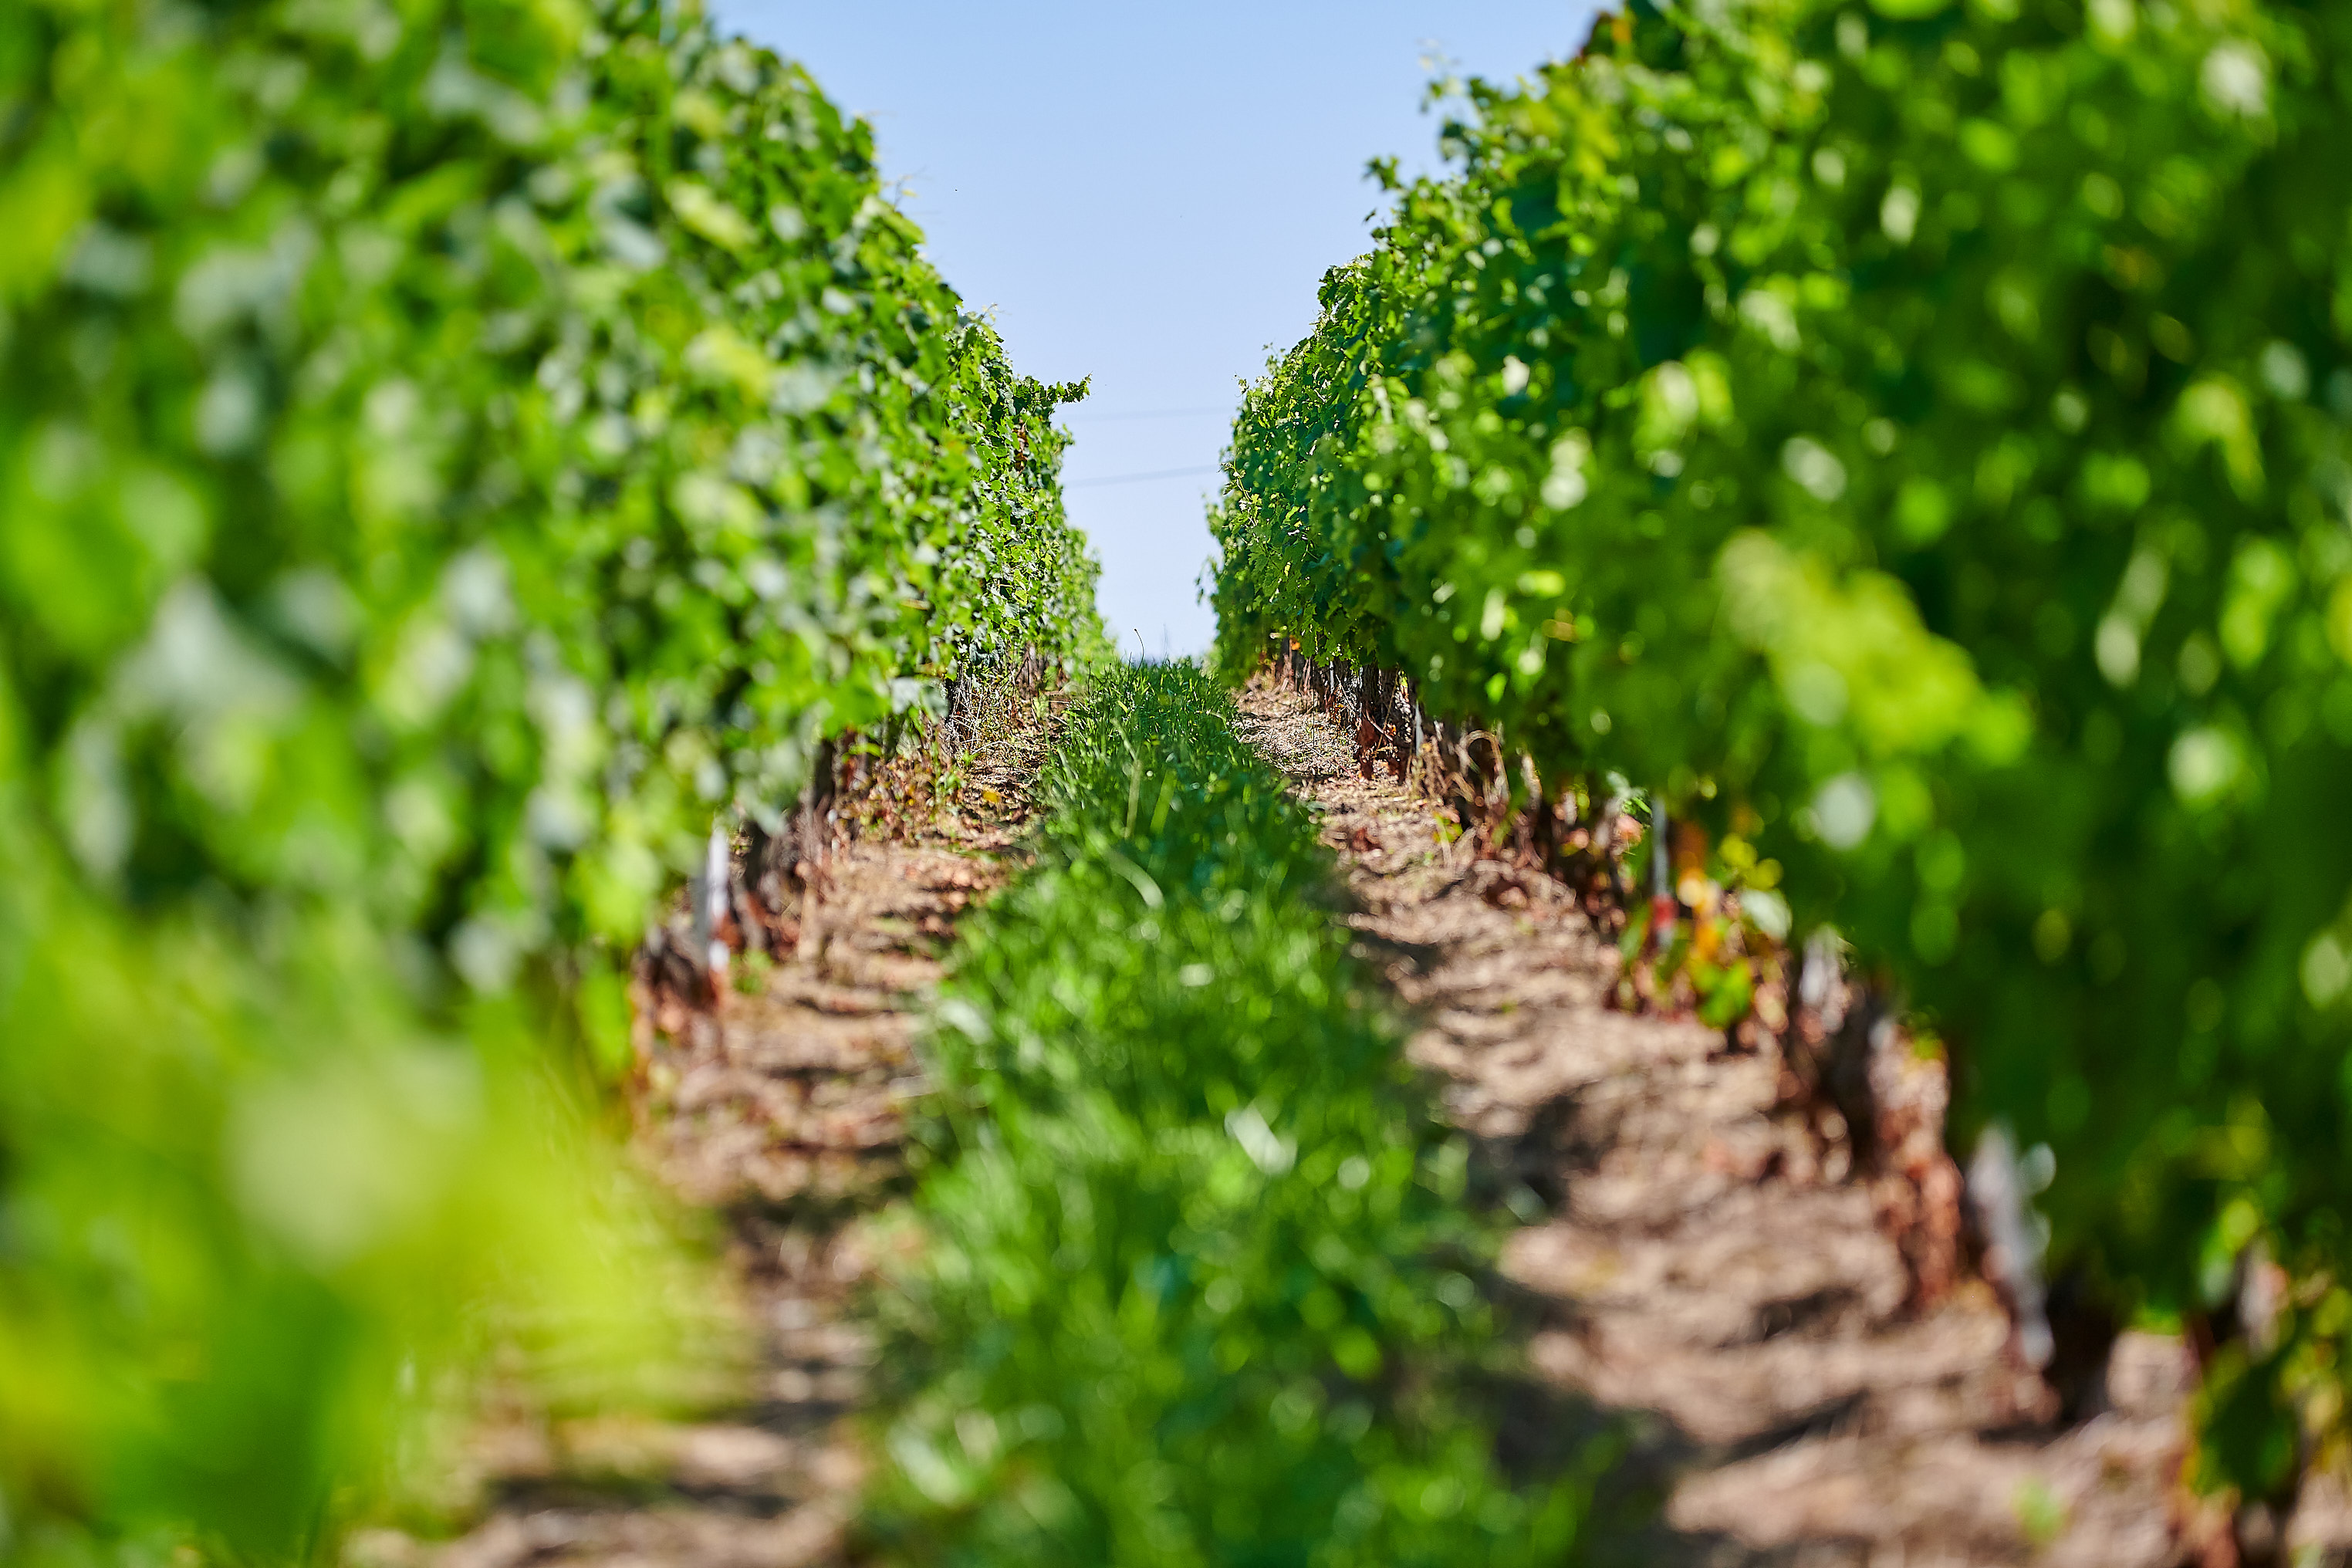 Row of Vines Vignobles Bertin